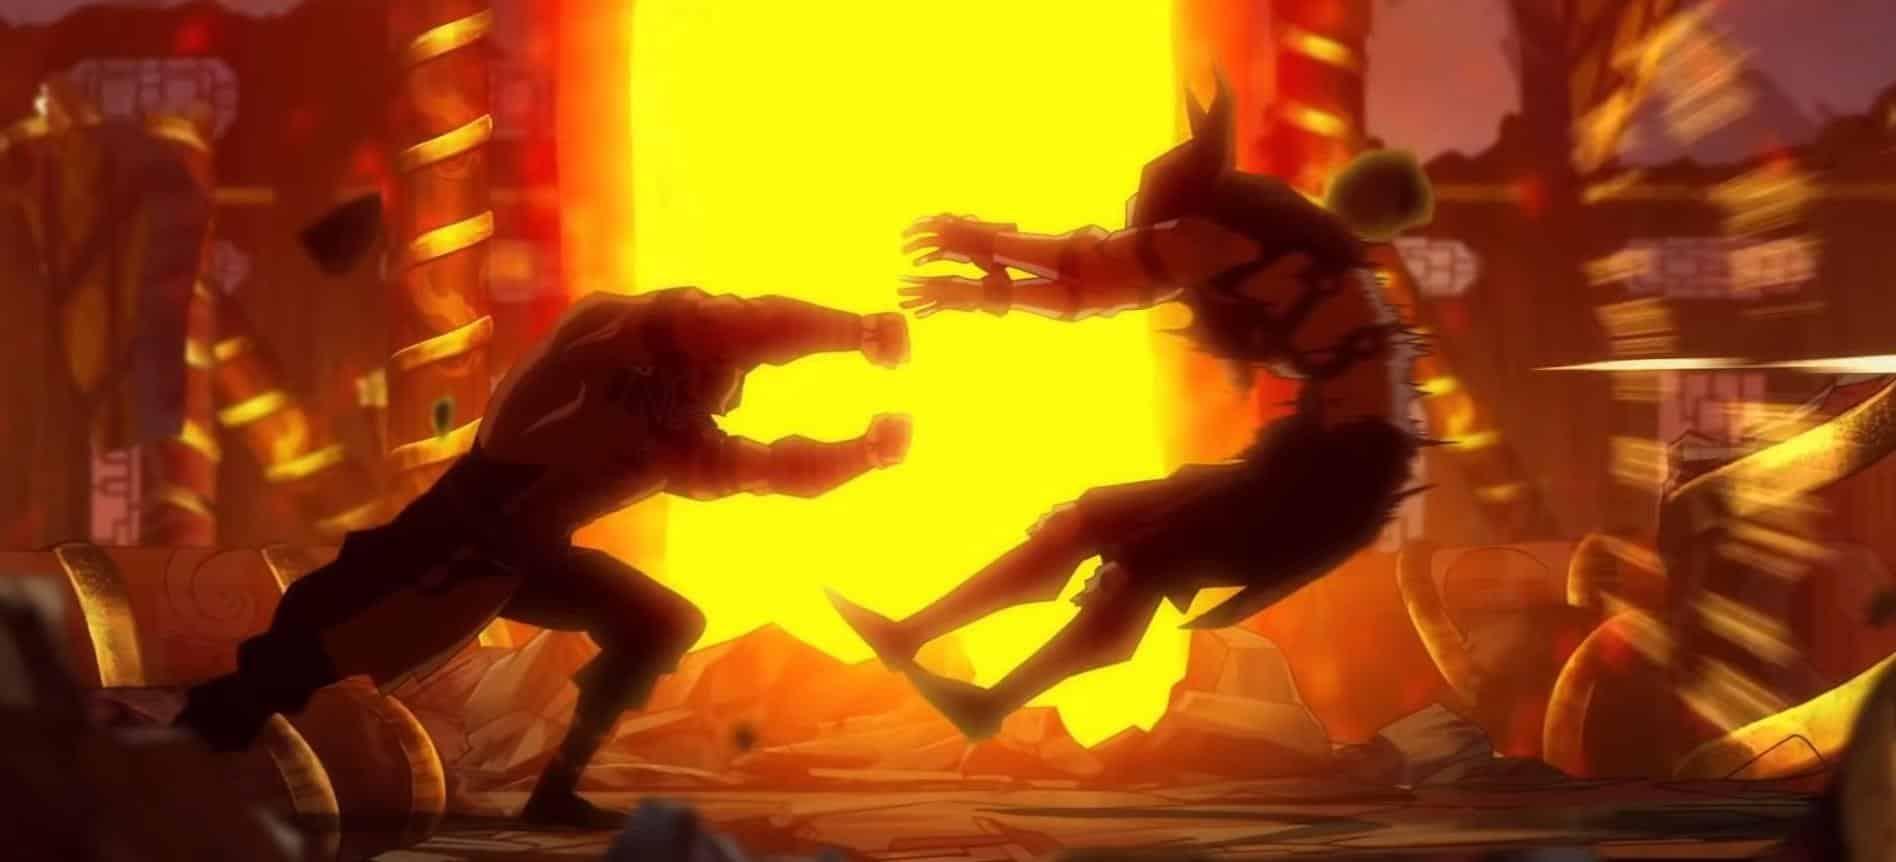 Get Over Here! Watch The Mortal Kombat Legends: Scorpion's Revenge Trailer